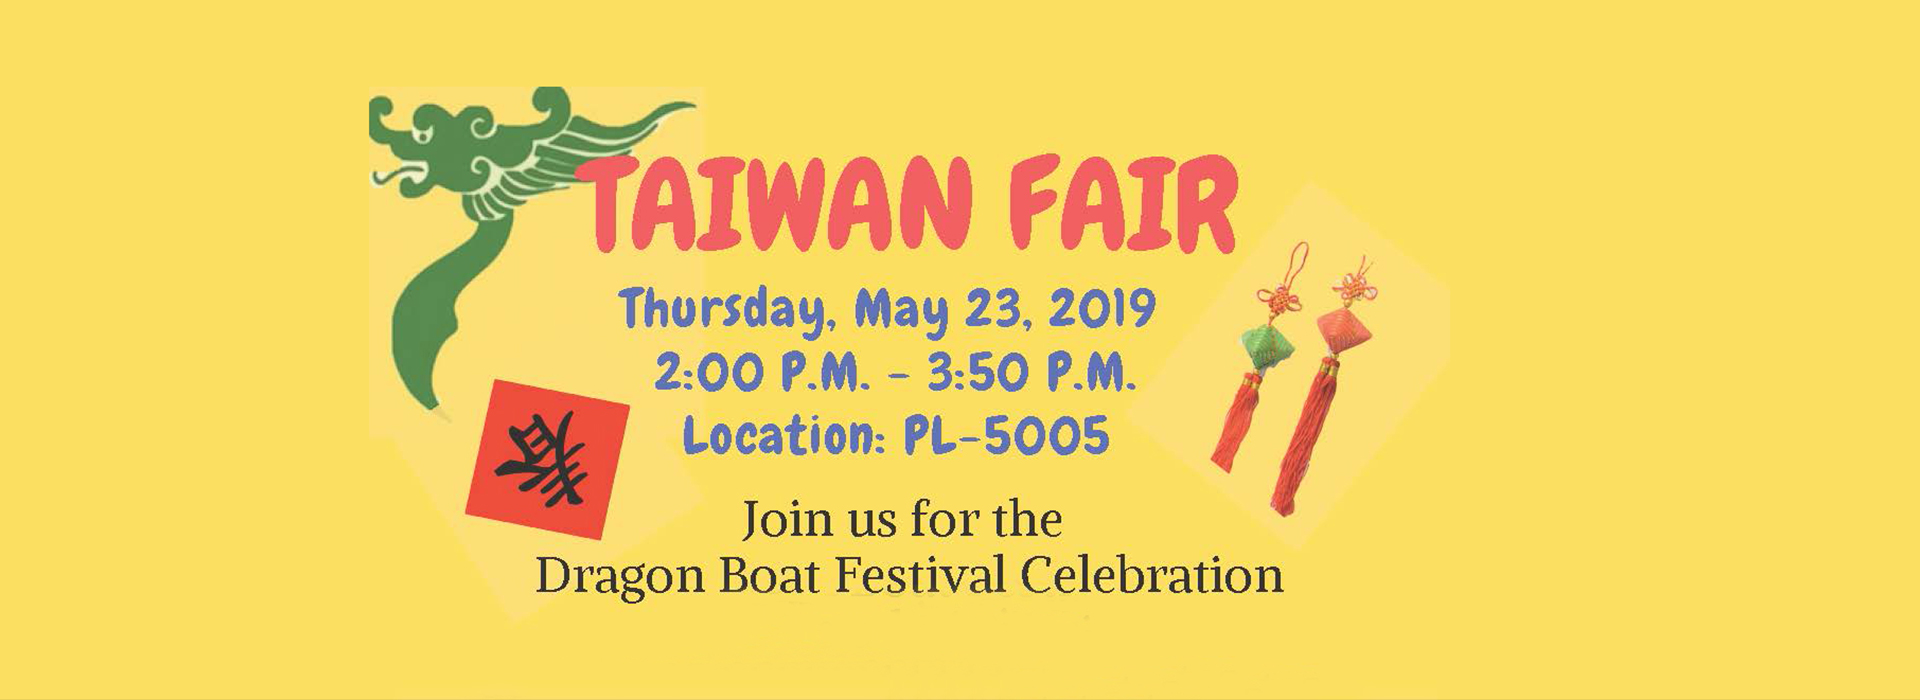 Taiwan Fair Dragon Boat Festival Celebration set for Thursday, May 23, at CSUSB